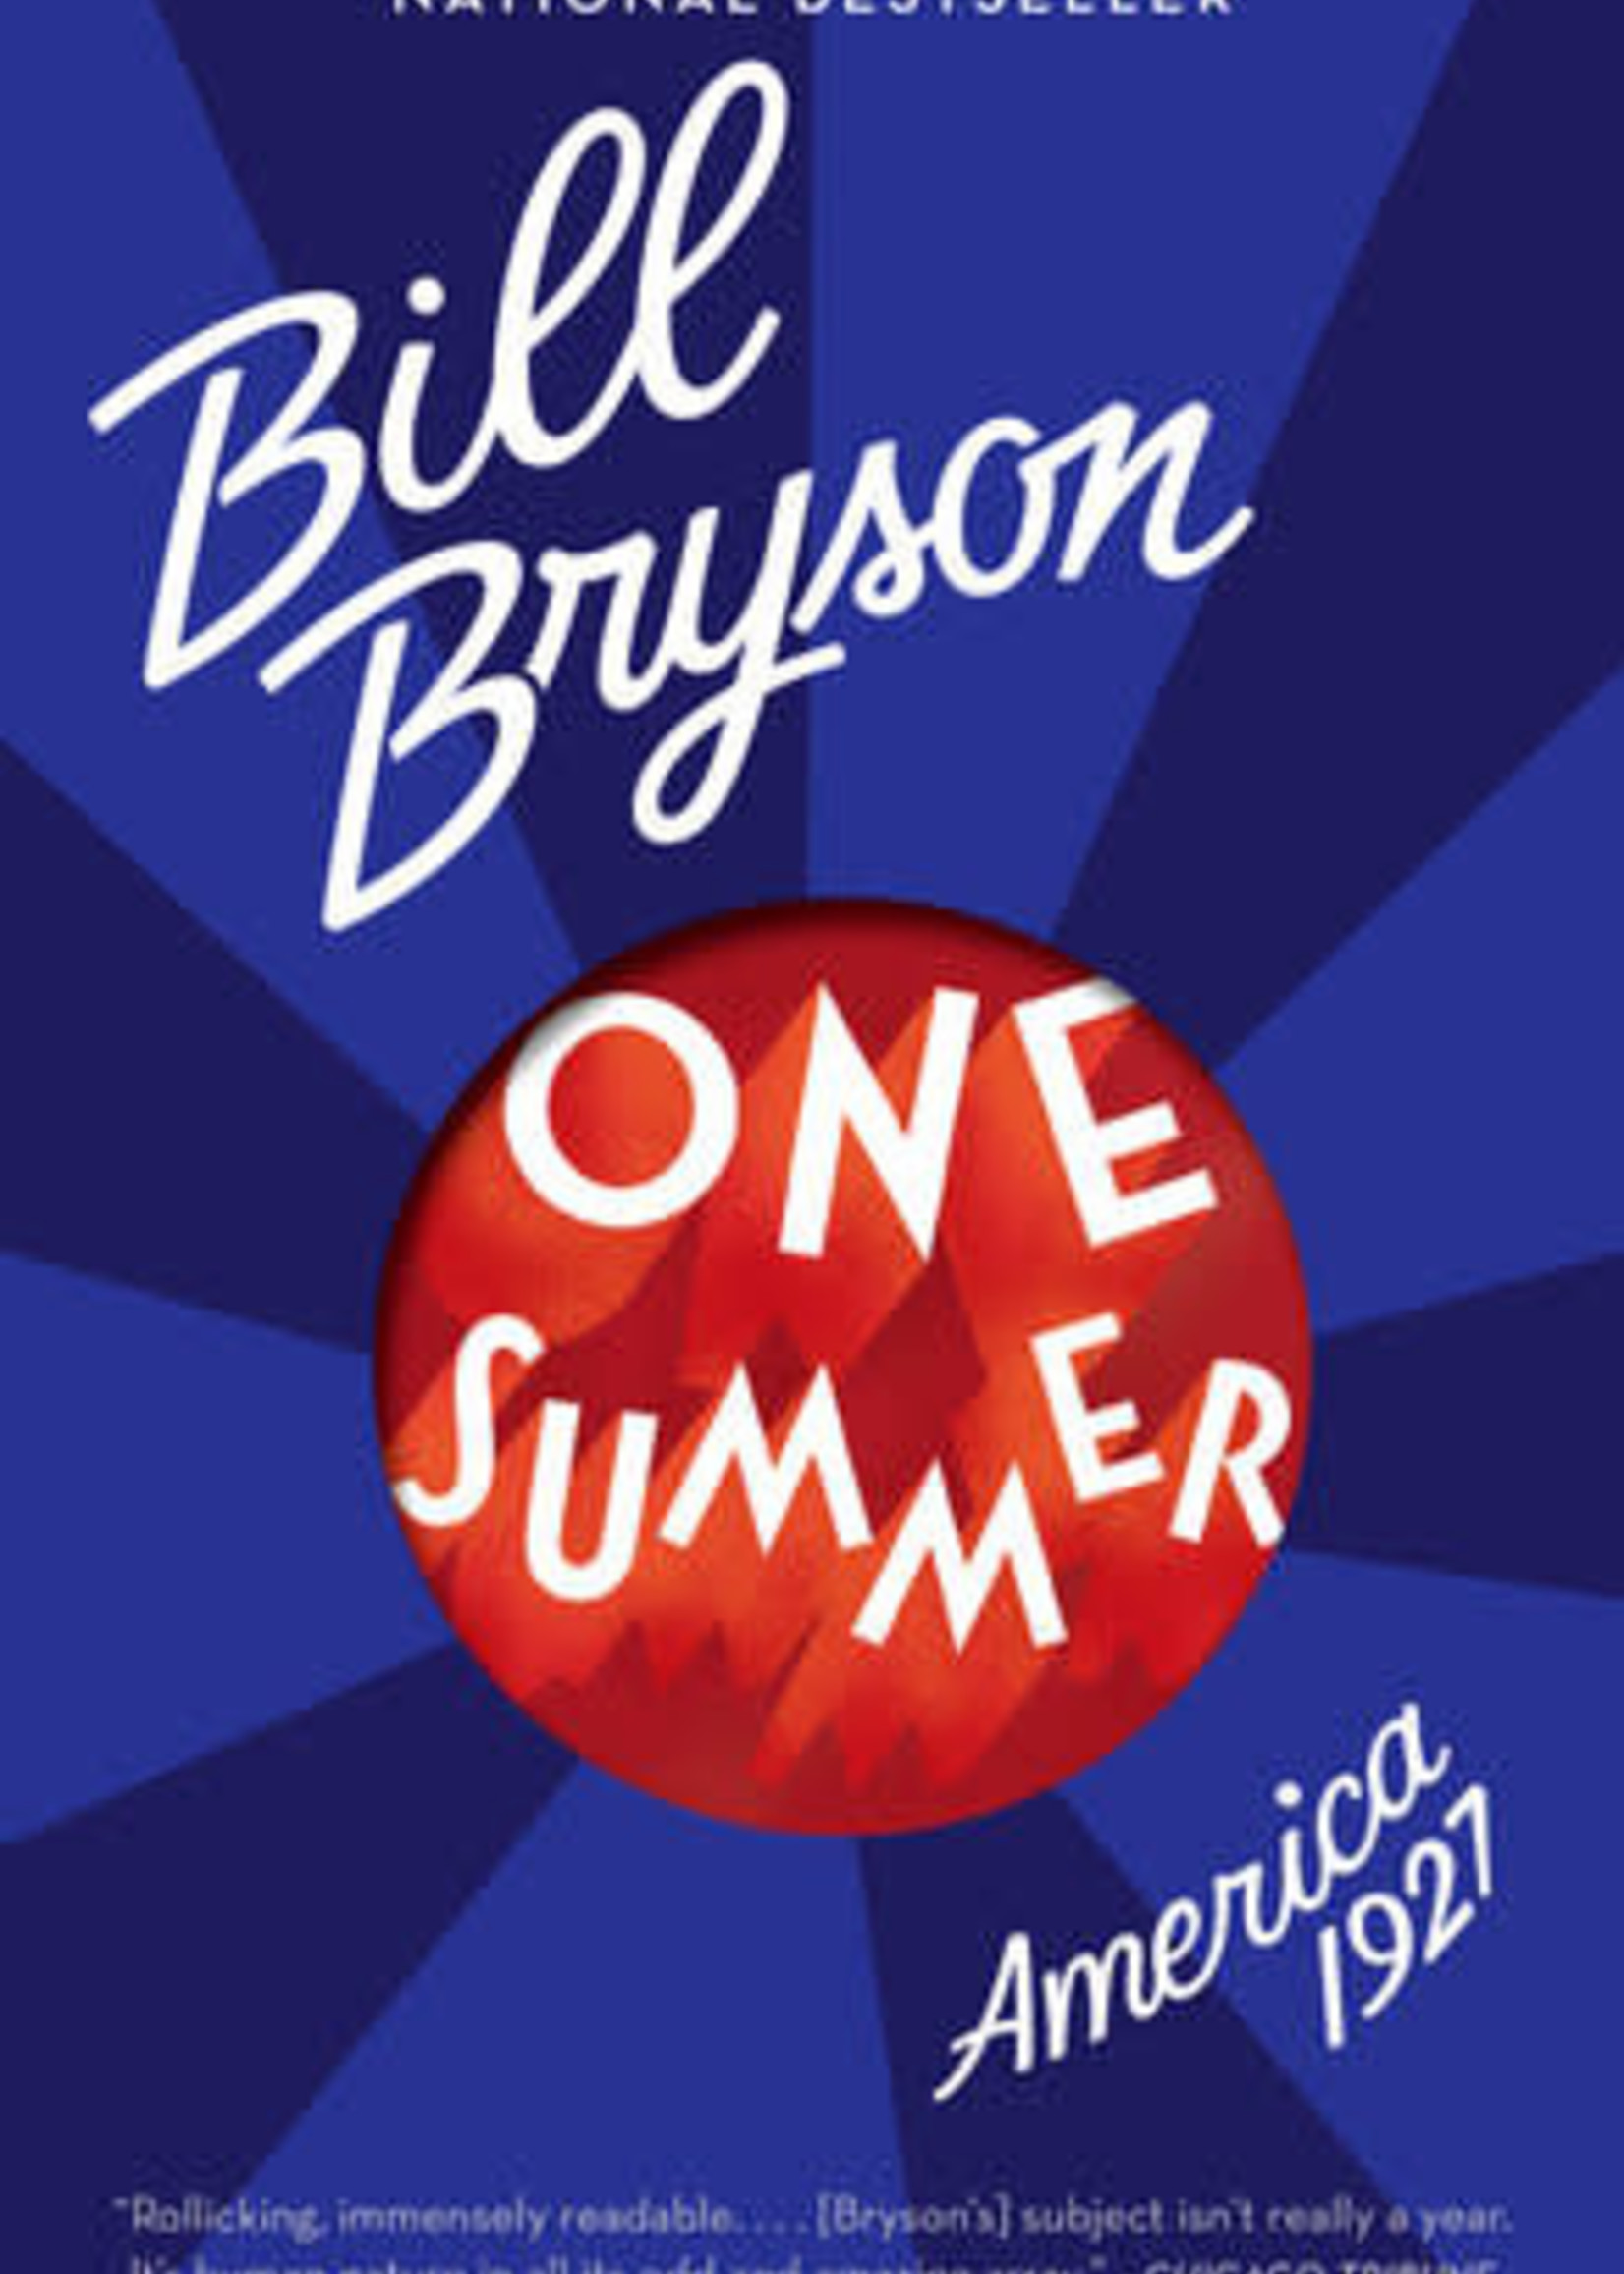 Penguin Random House Bryson One Summer